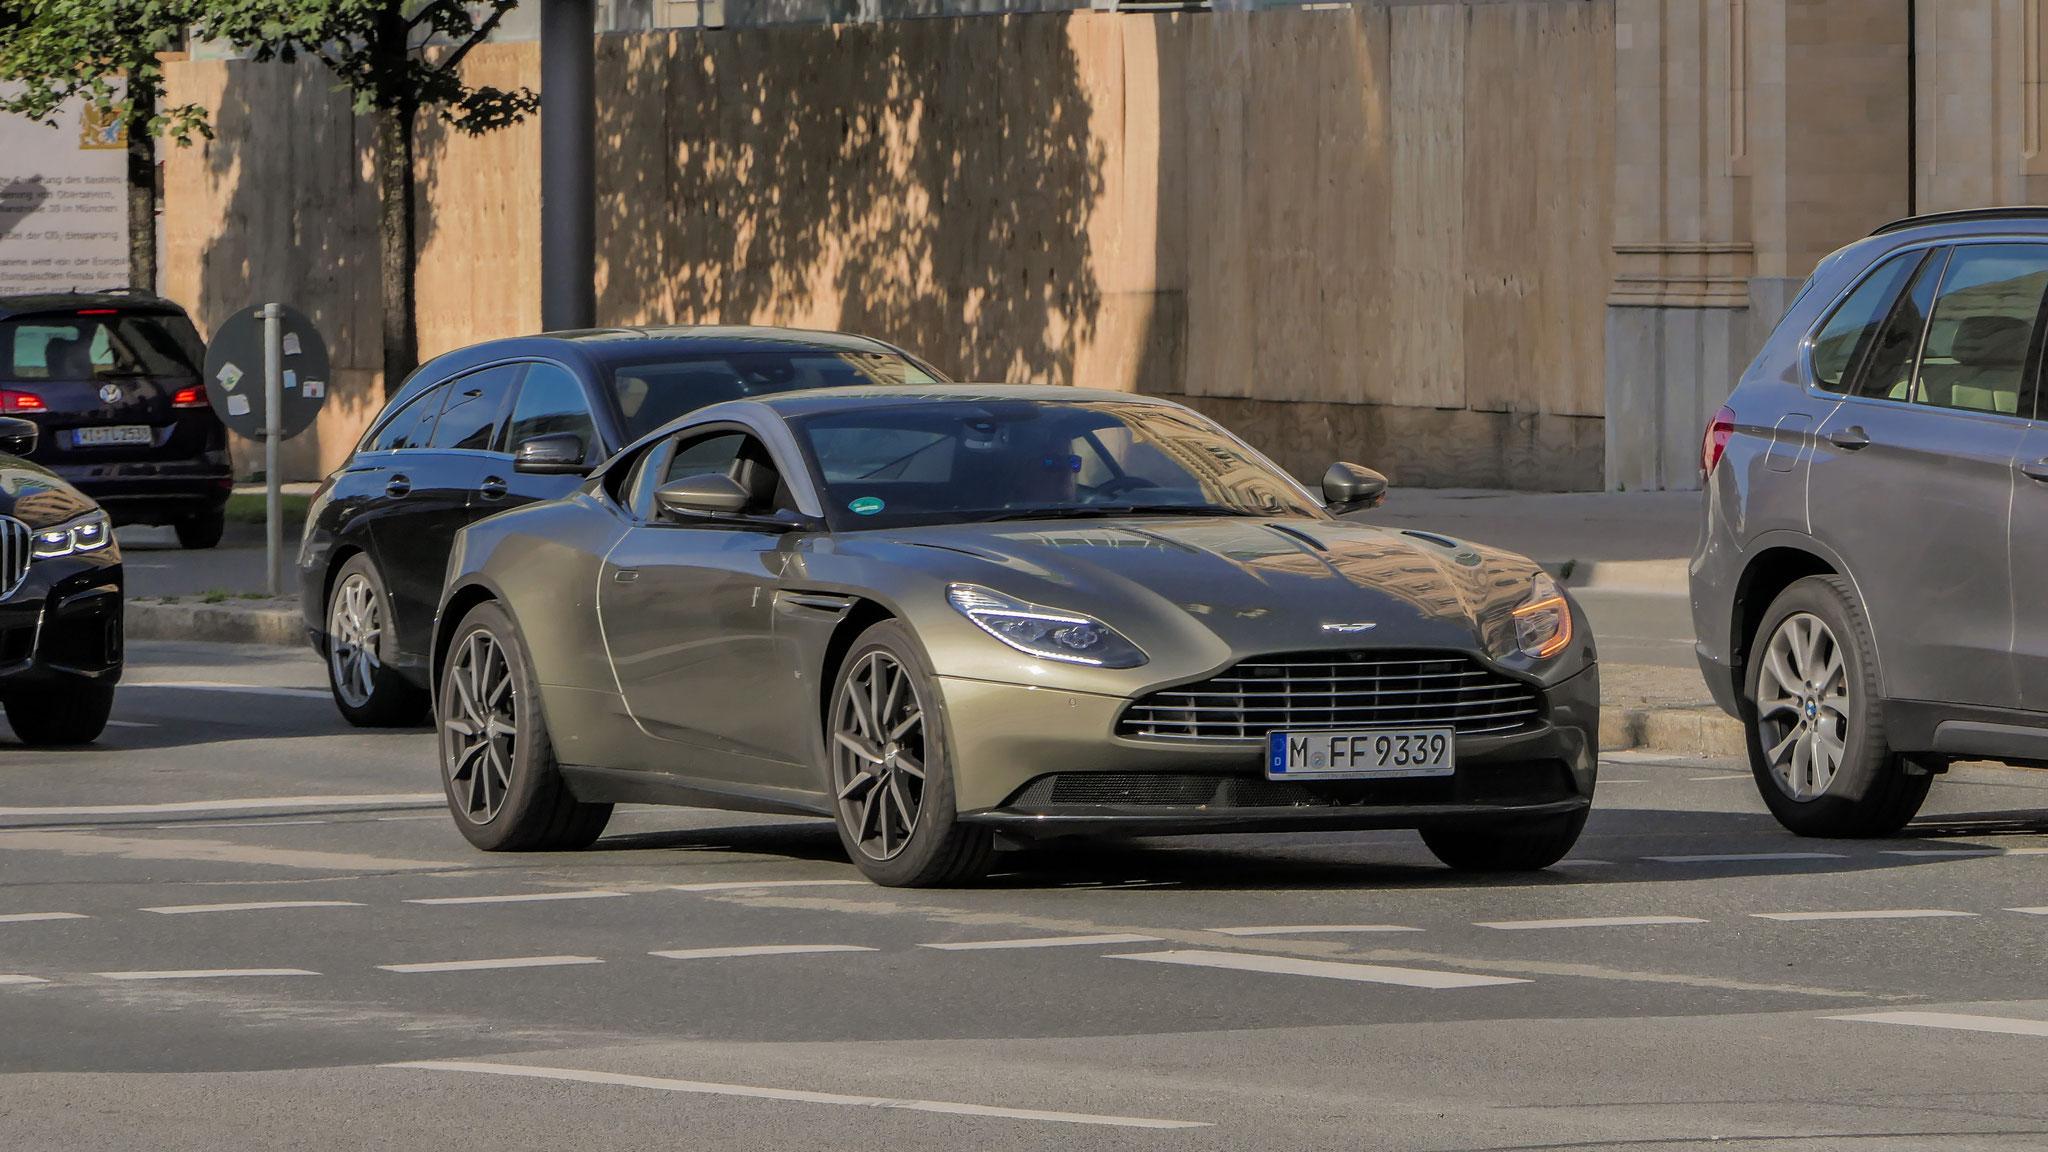 Aston Martin DB11 - M-FF-9339